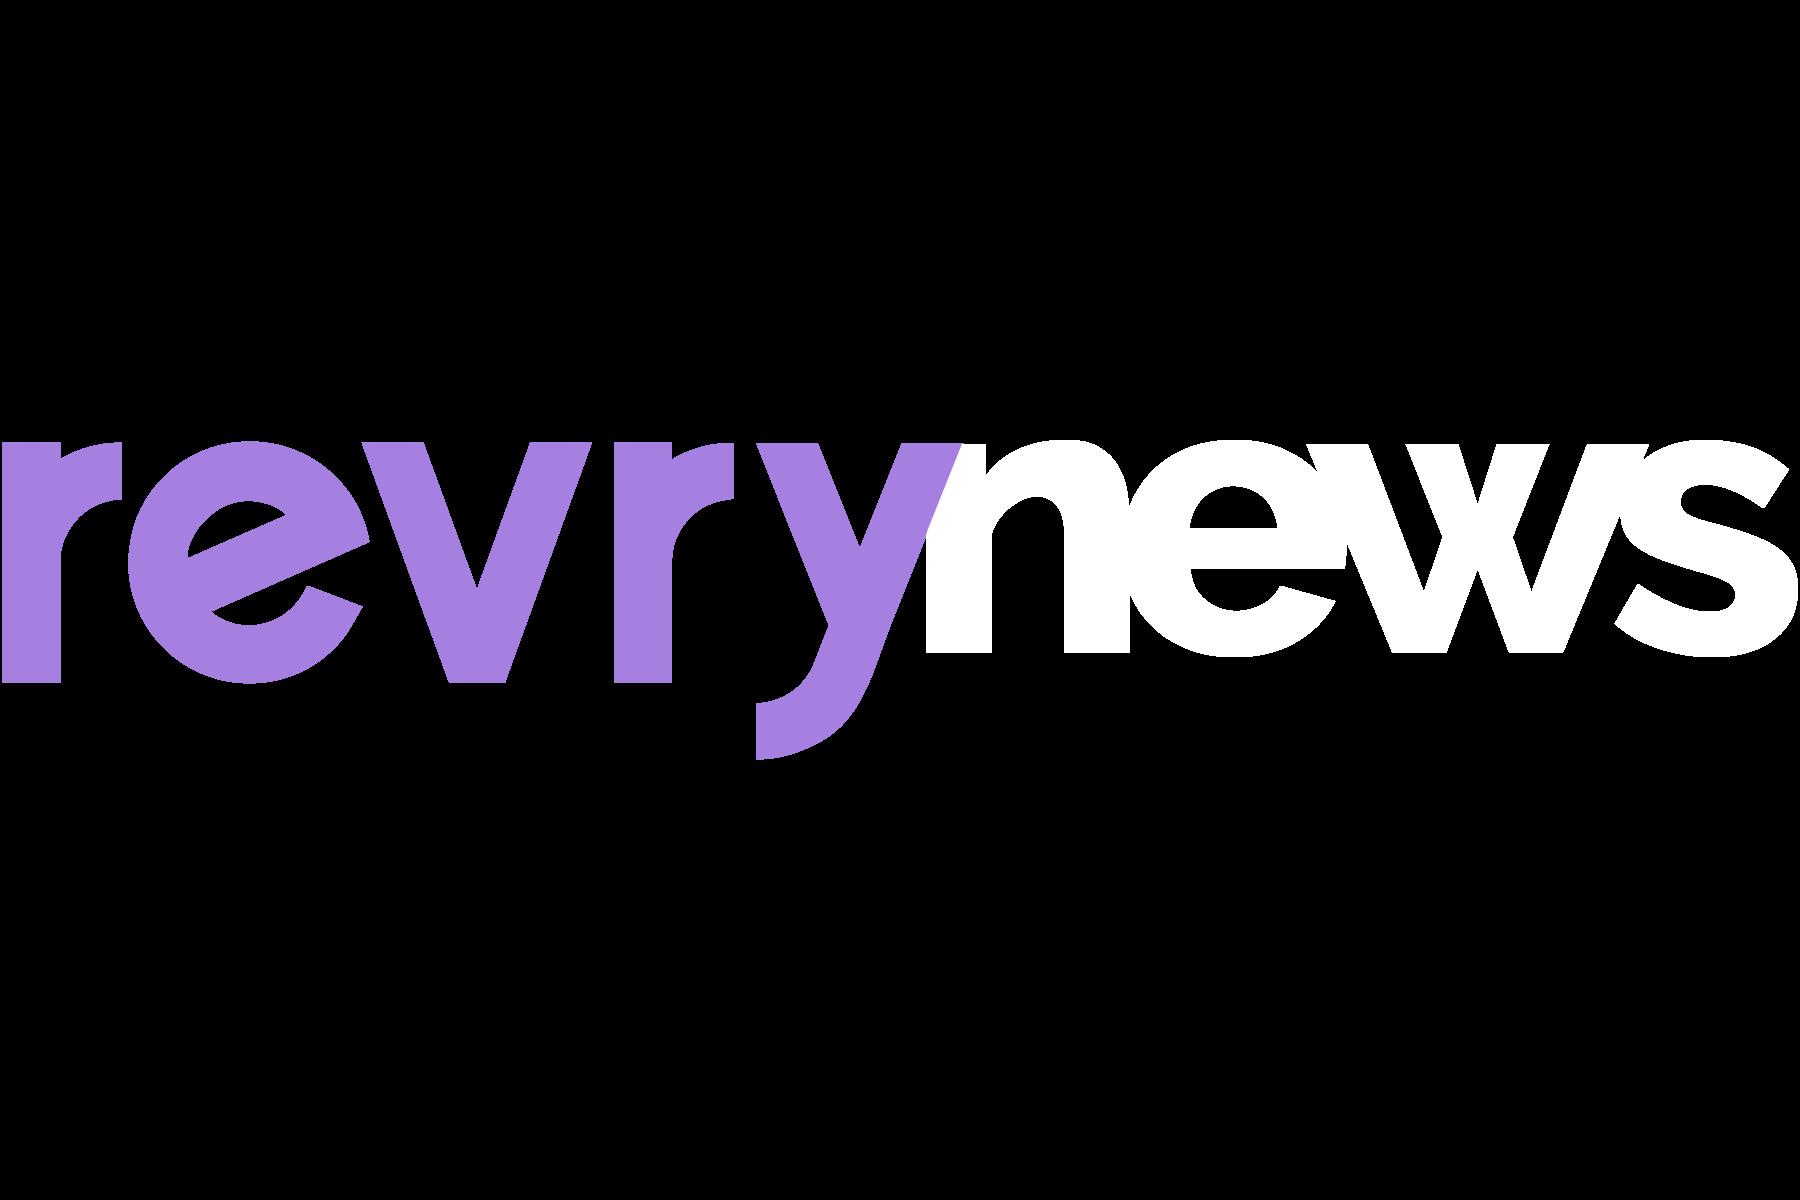 RevryNews